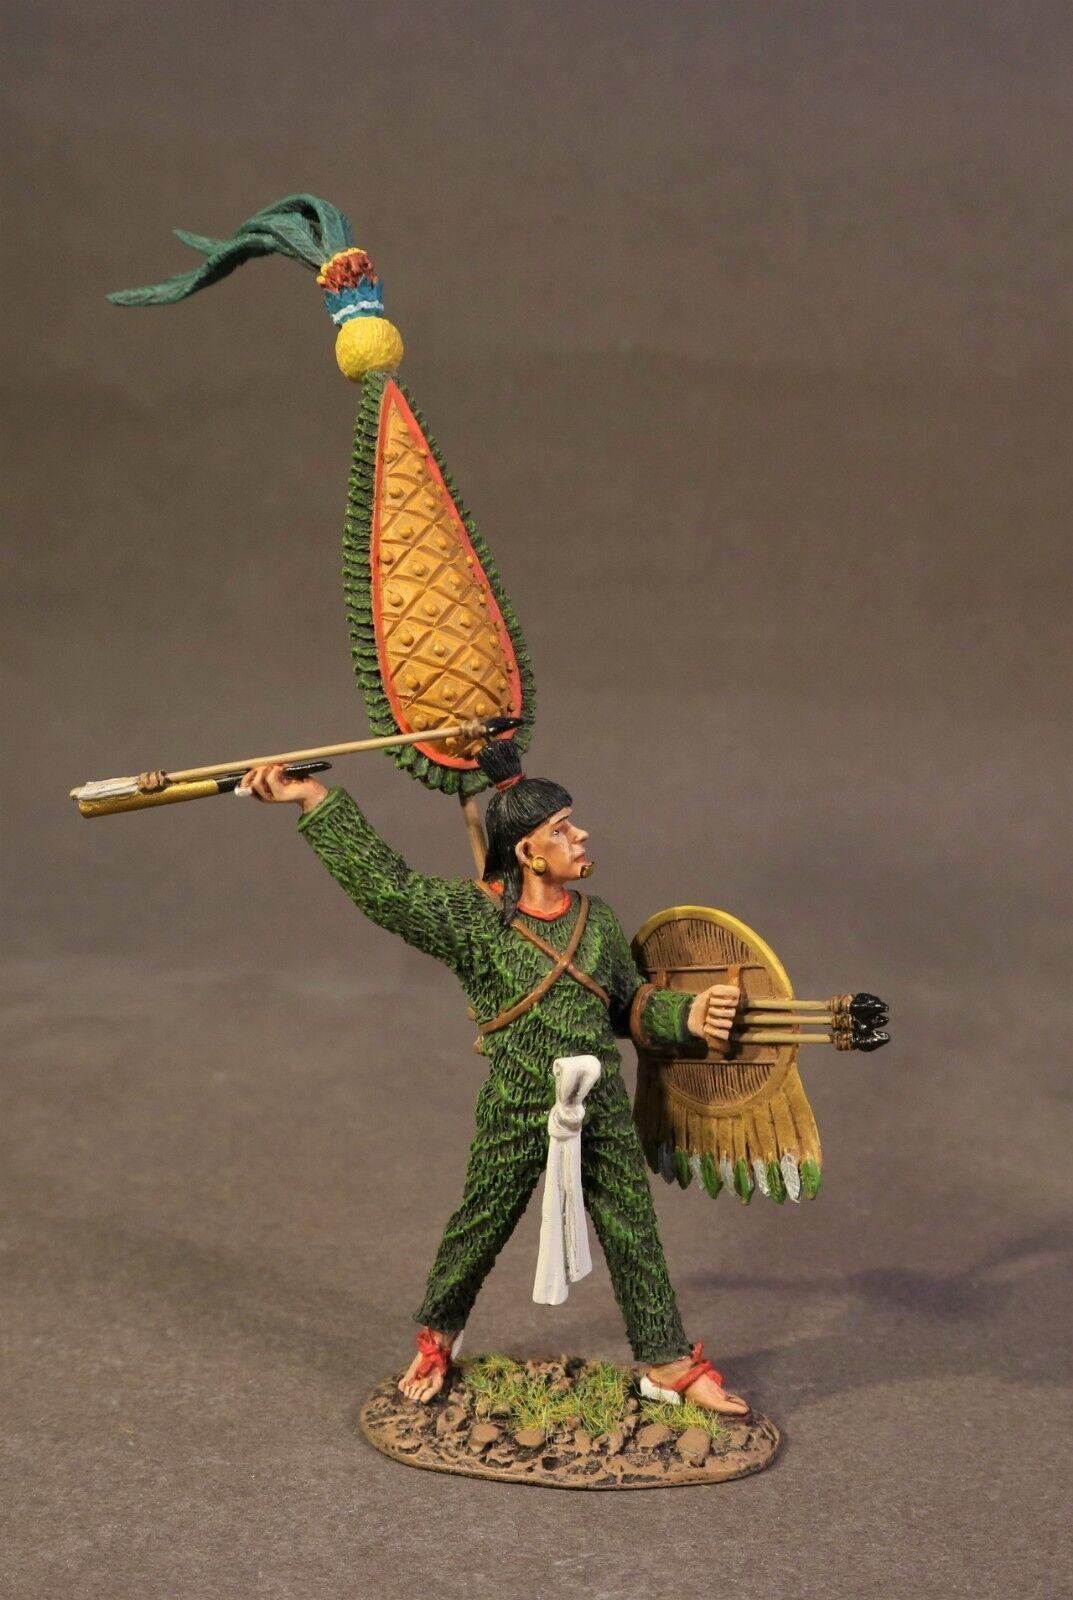 John Jenkins Azteken & Conquistadors AZ-12 Aztekenmuster Krieger mit Atlatl MIB